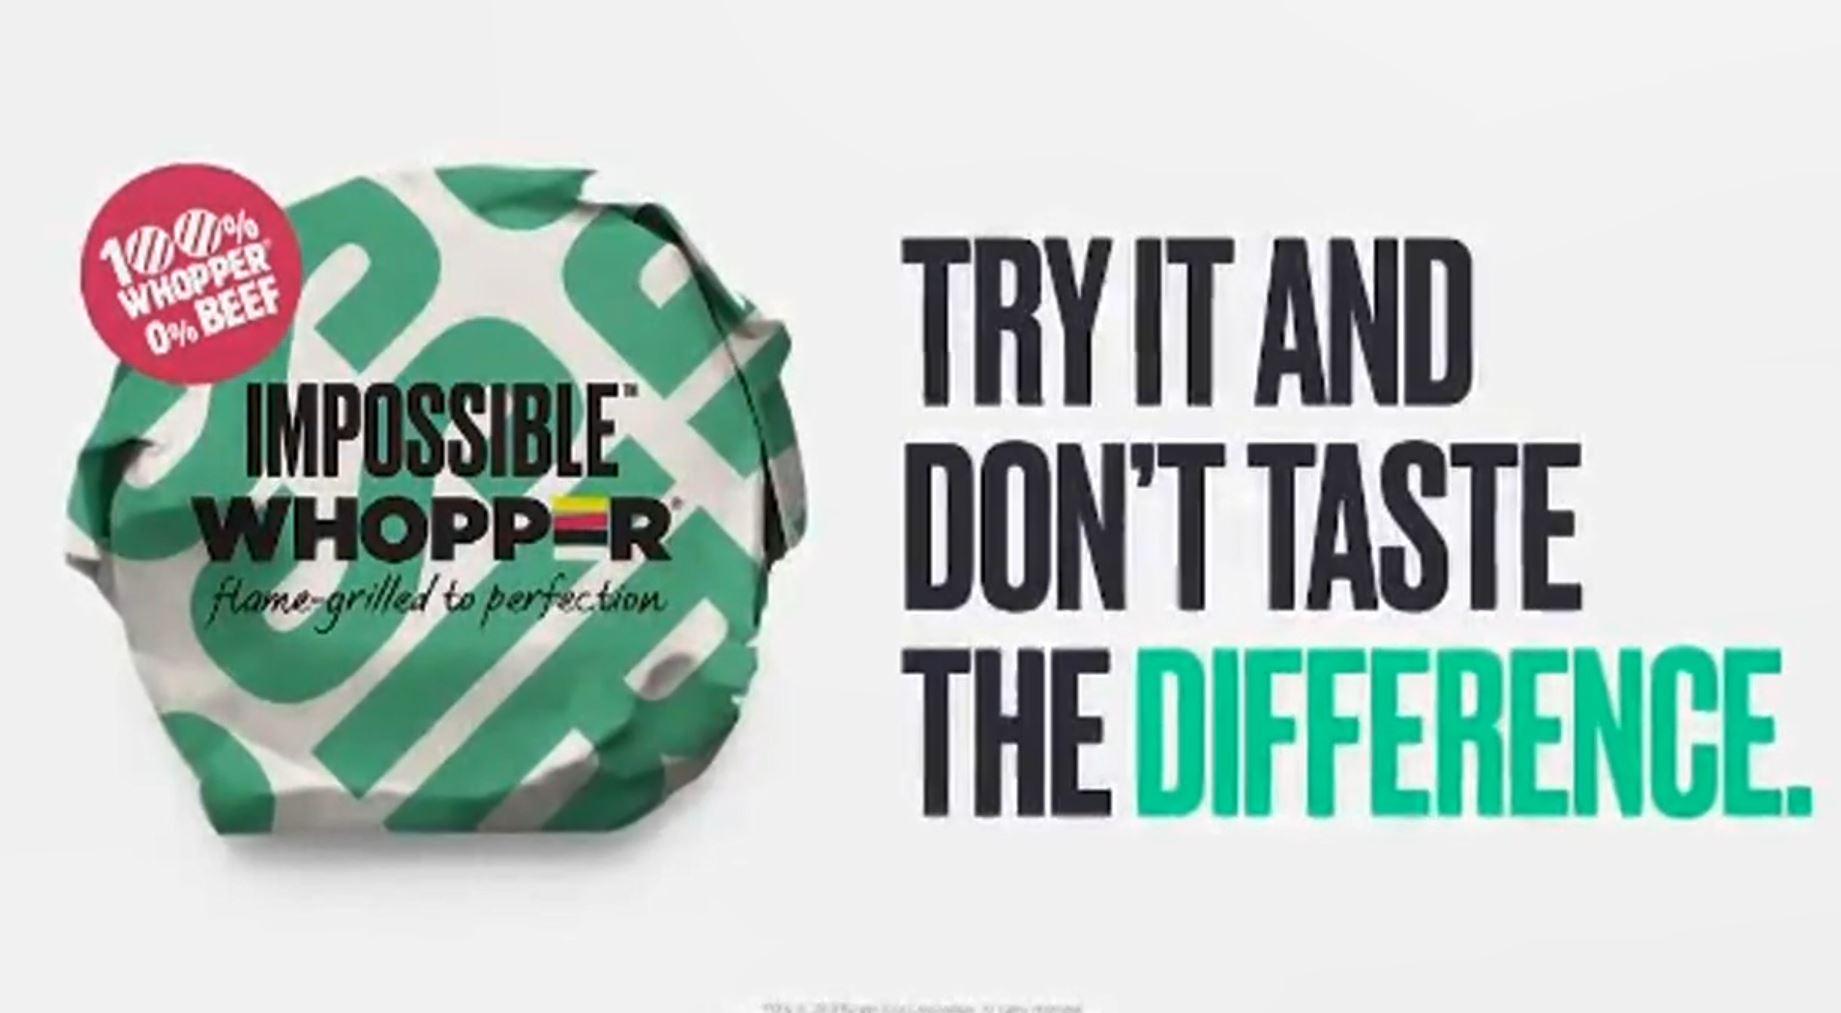 impossible whopper_1556543163598.JPG.jpg